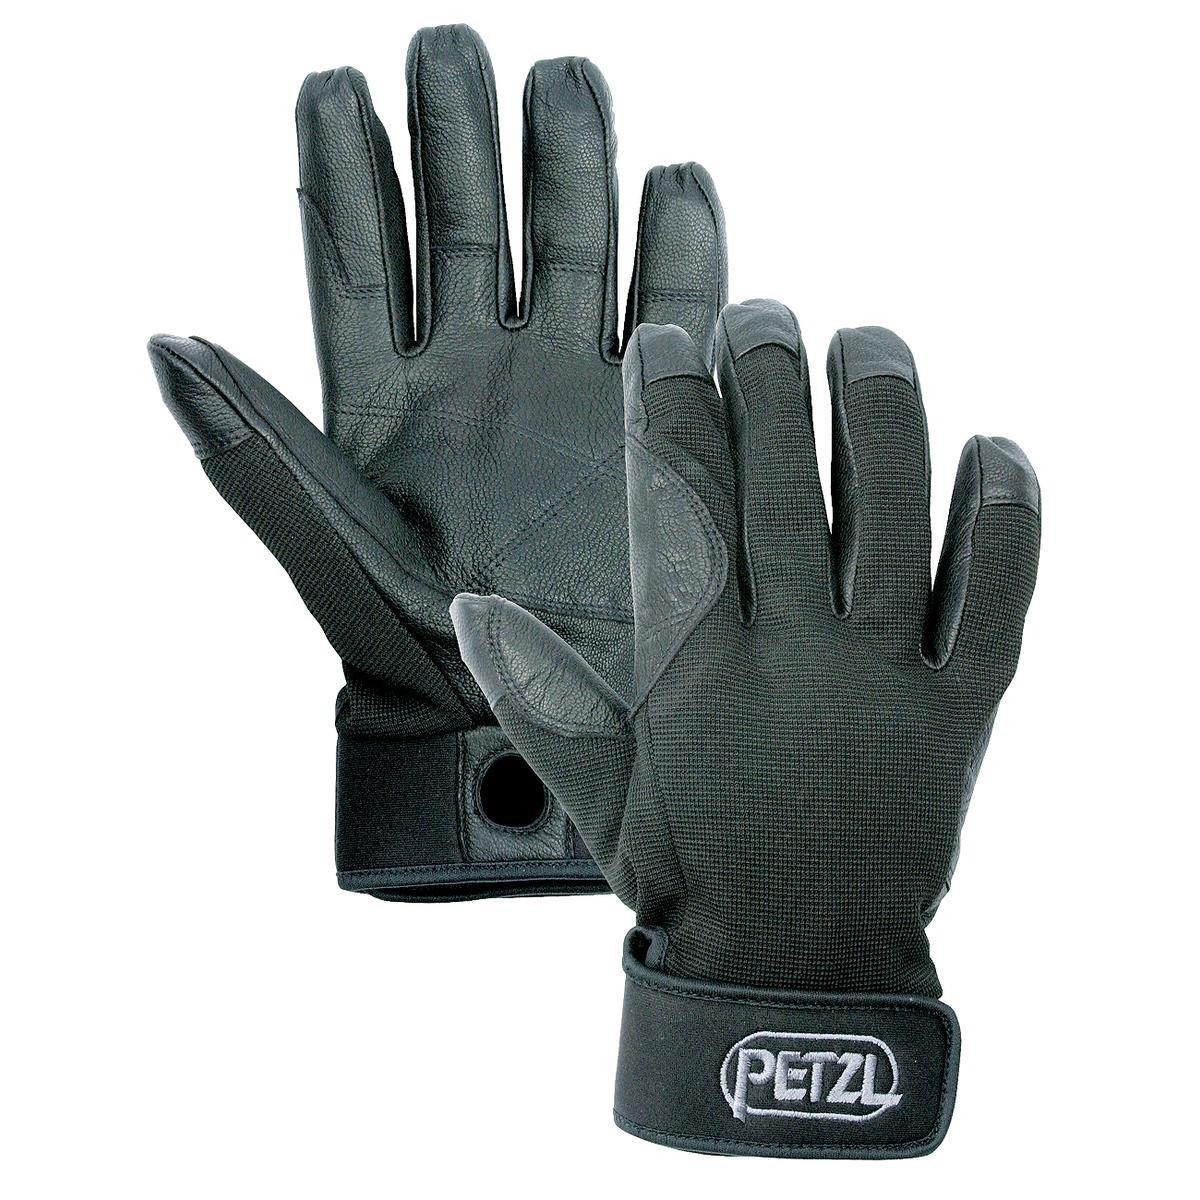 Petzl K52 CORDEX Lightweight Glove, Black, Small